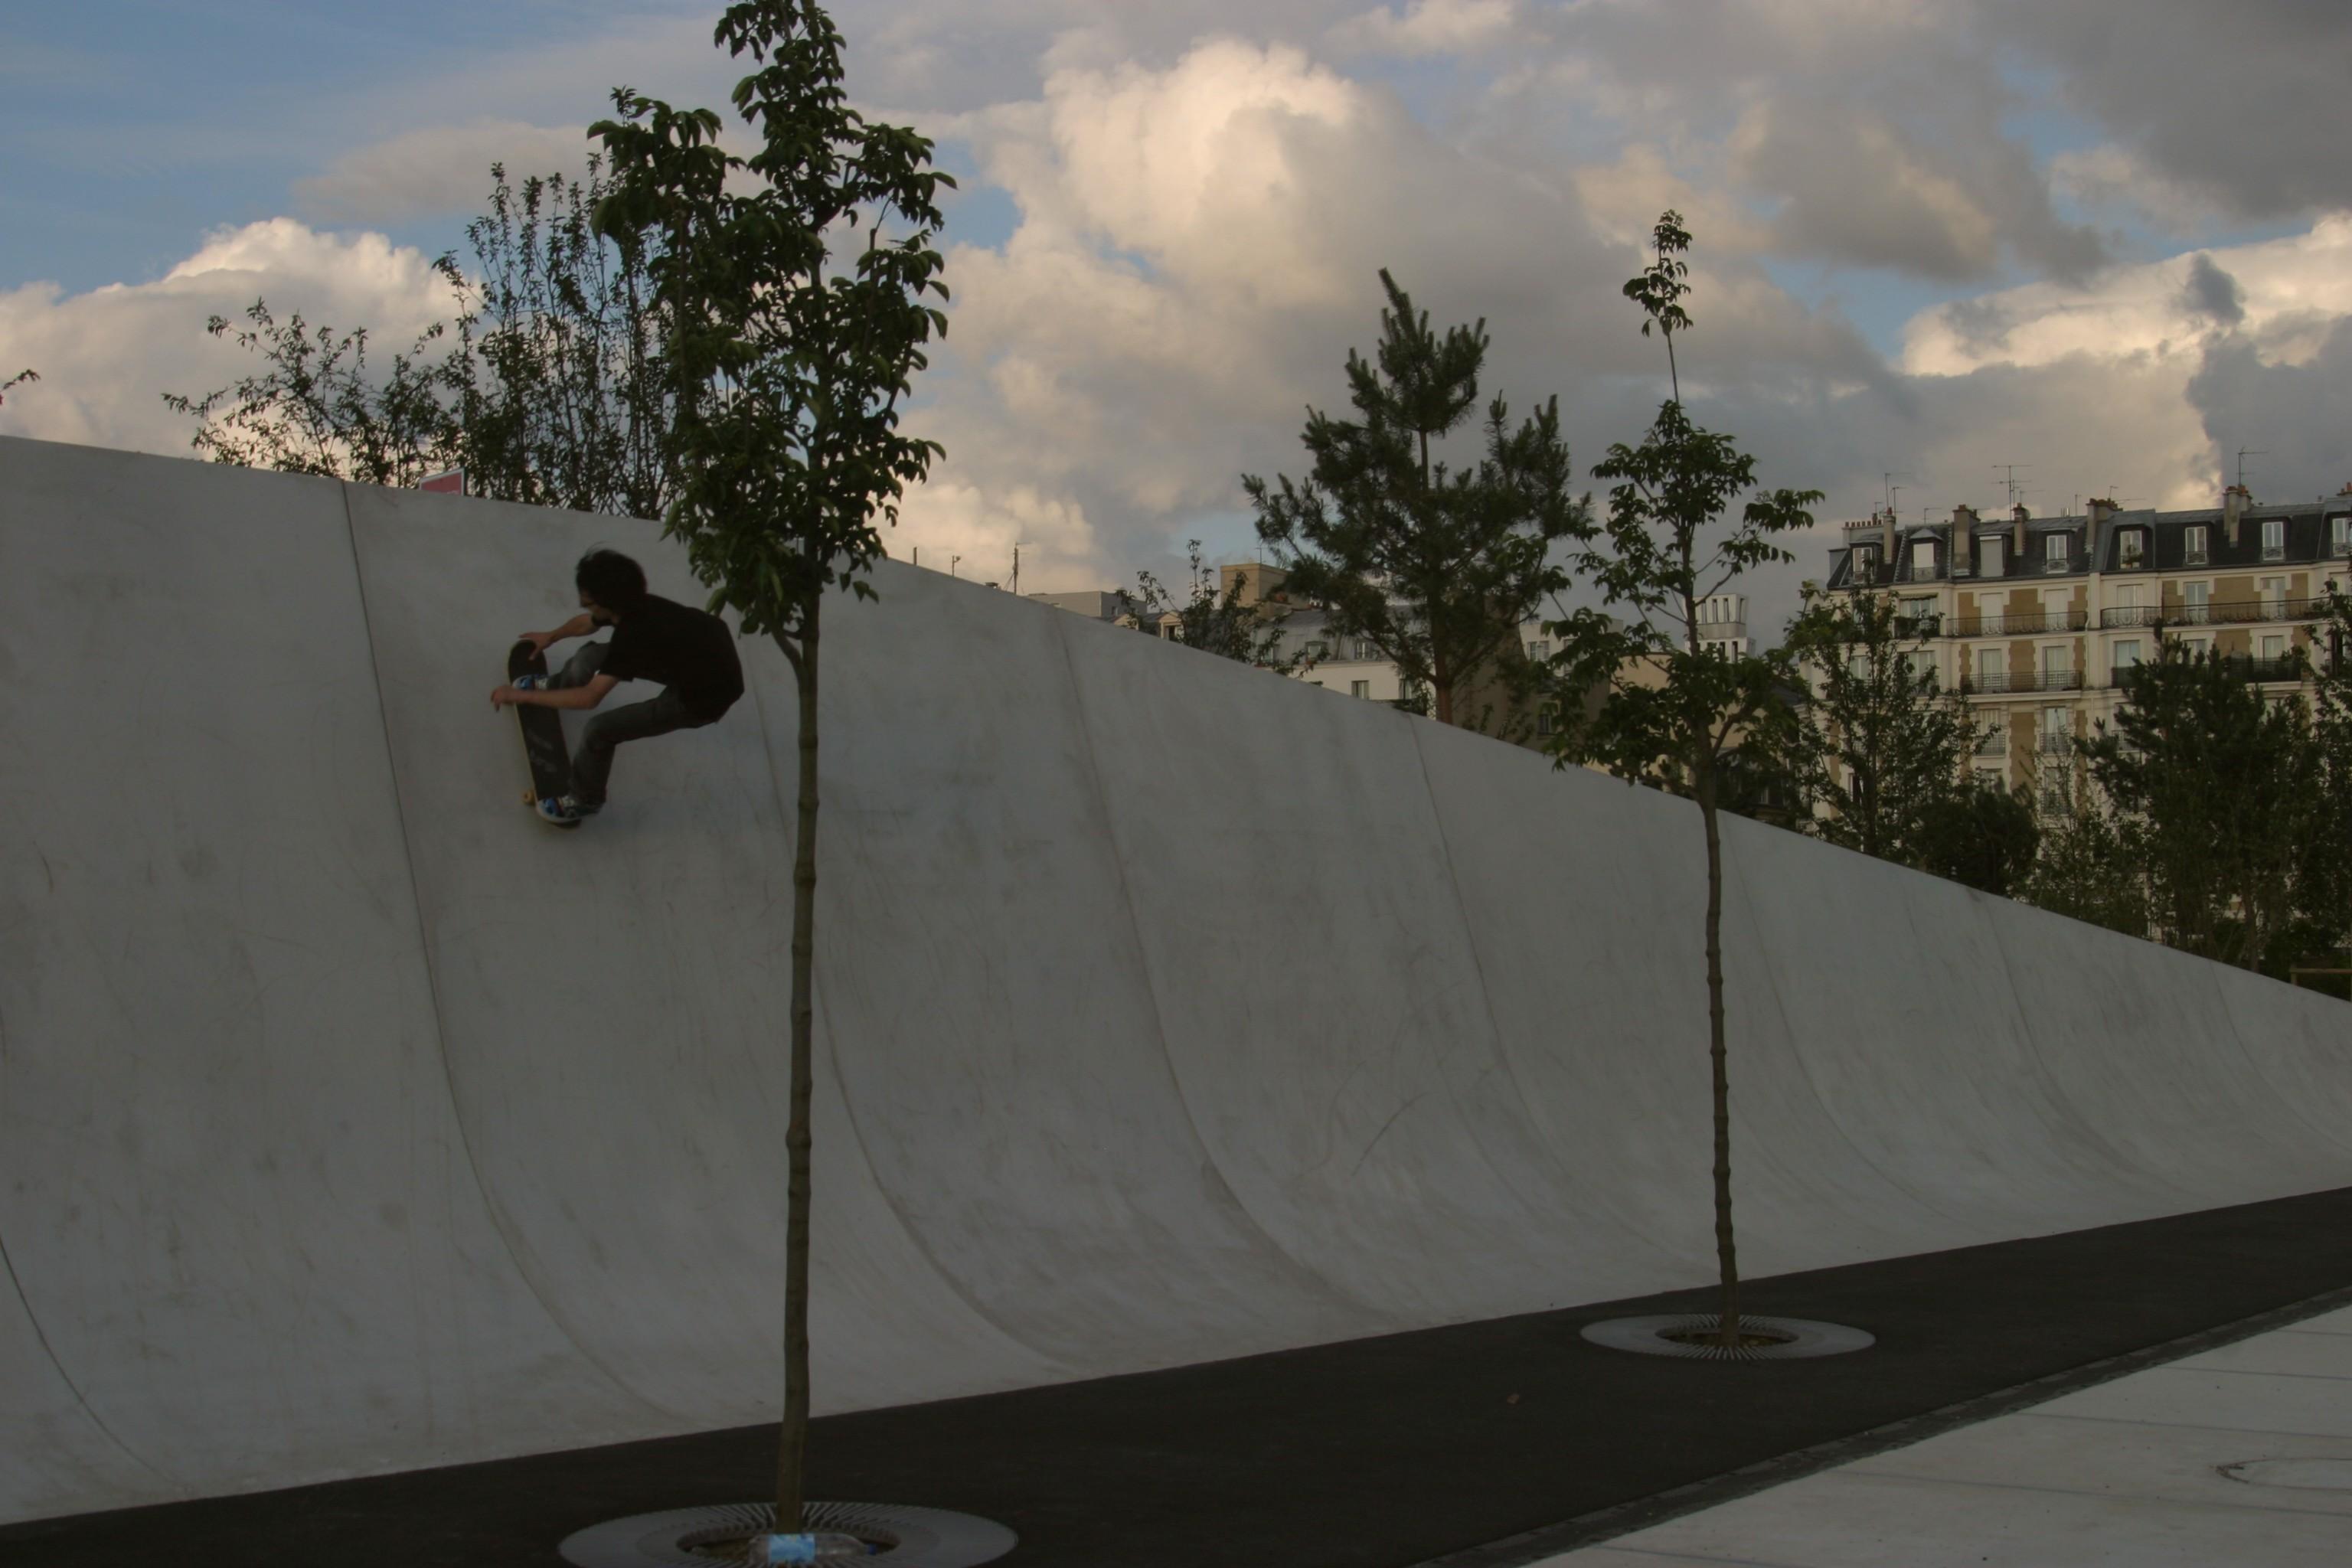 Skate Park Quartier des Batignolles1